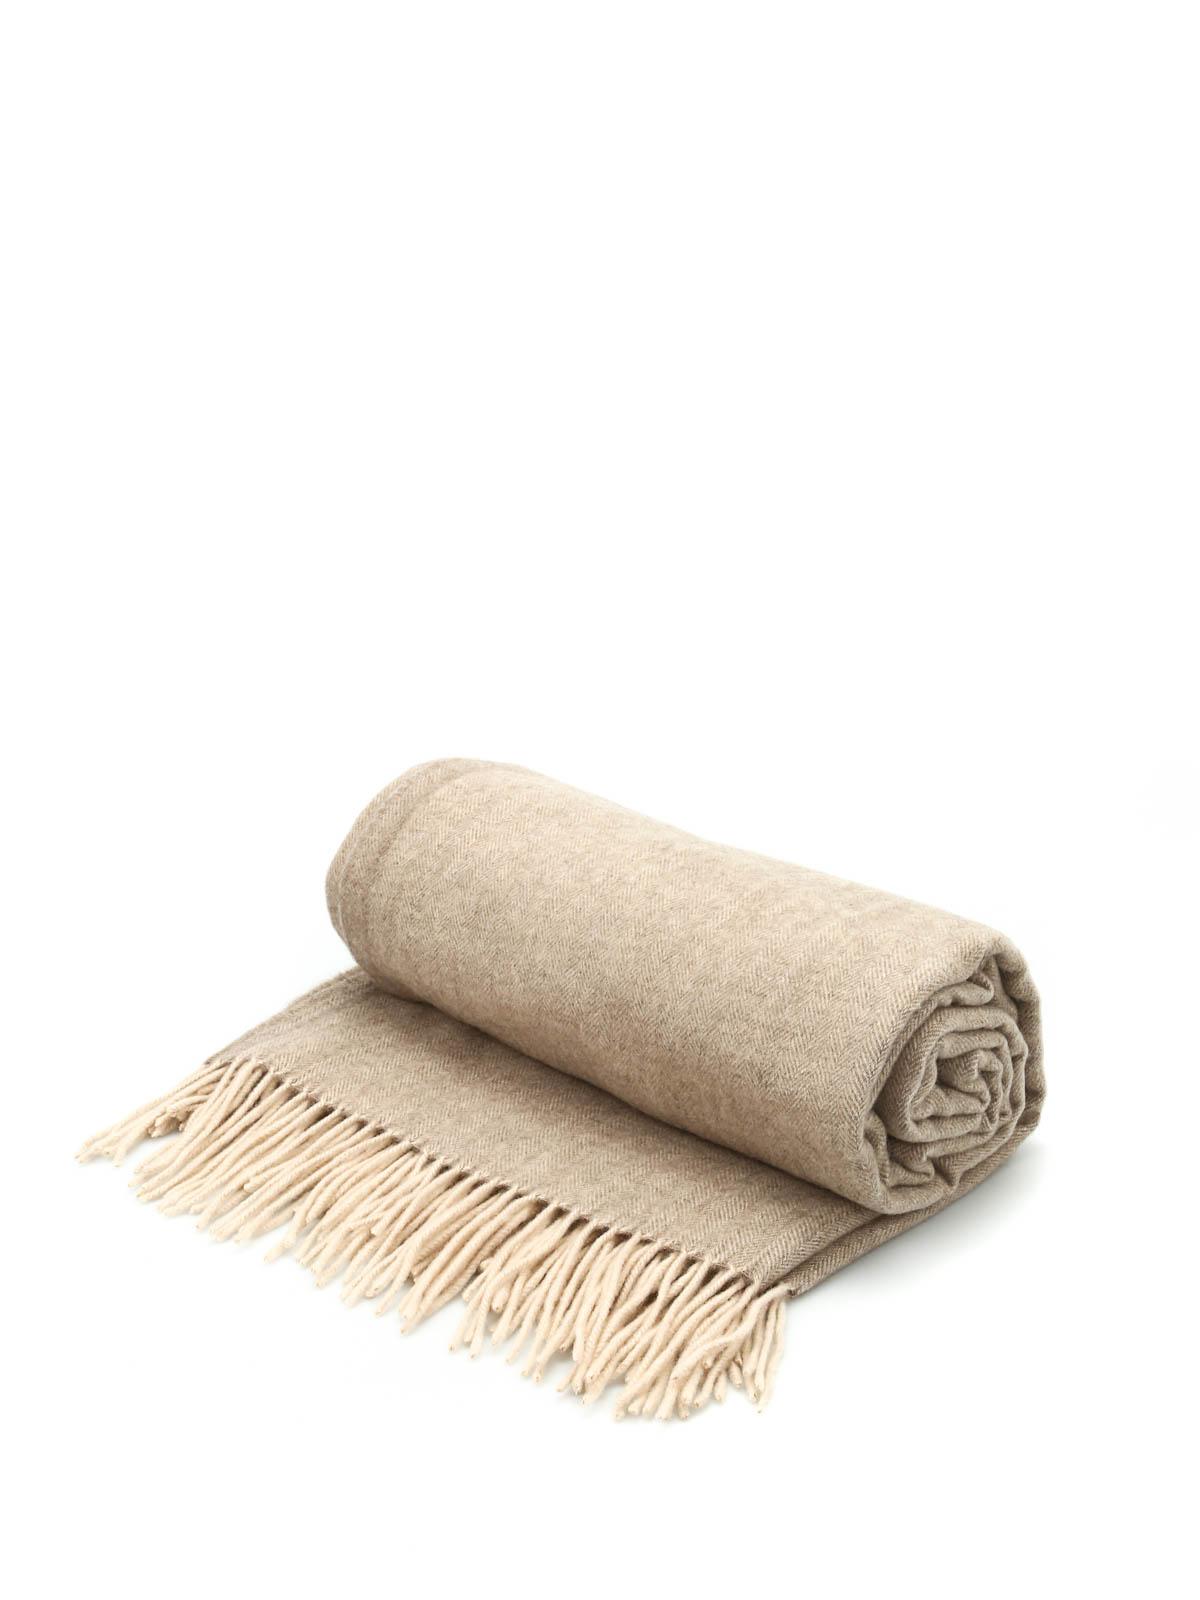 Herringbone Cashmere Throw By Company Blankets